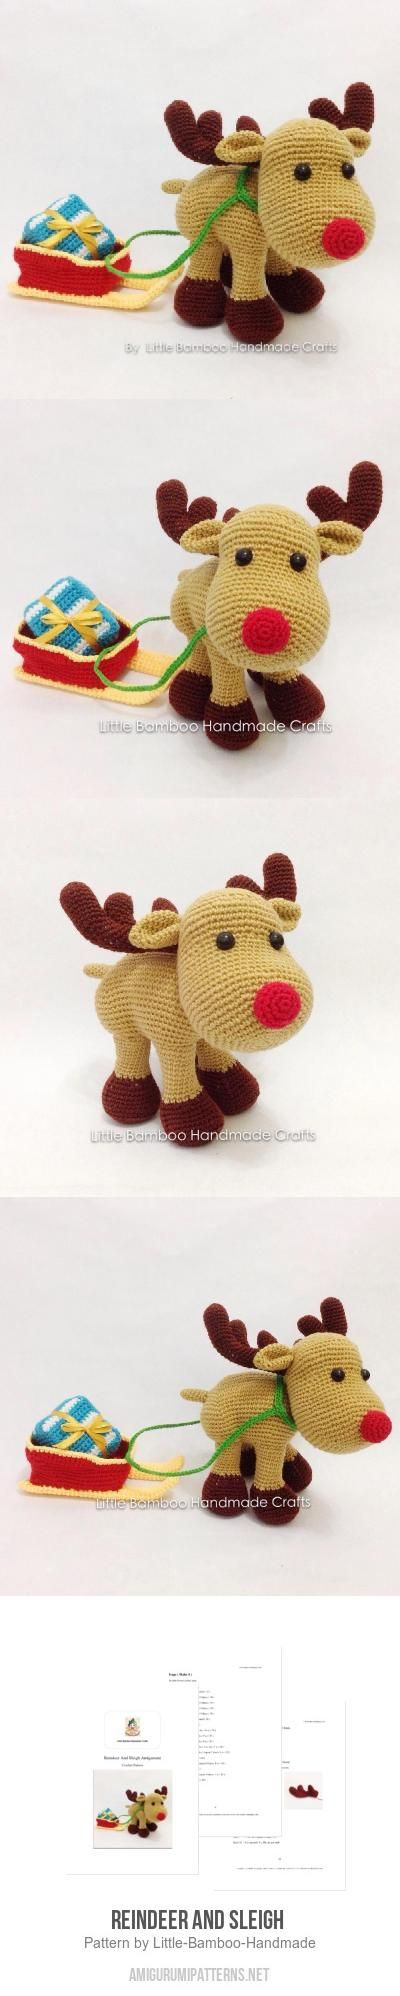 Reindeer and moose amigurumi pattern by one and two company reindeer and moose amigurumi pattern by one and two company crochet tricot et doudous bankloansurffo Choice Image